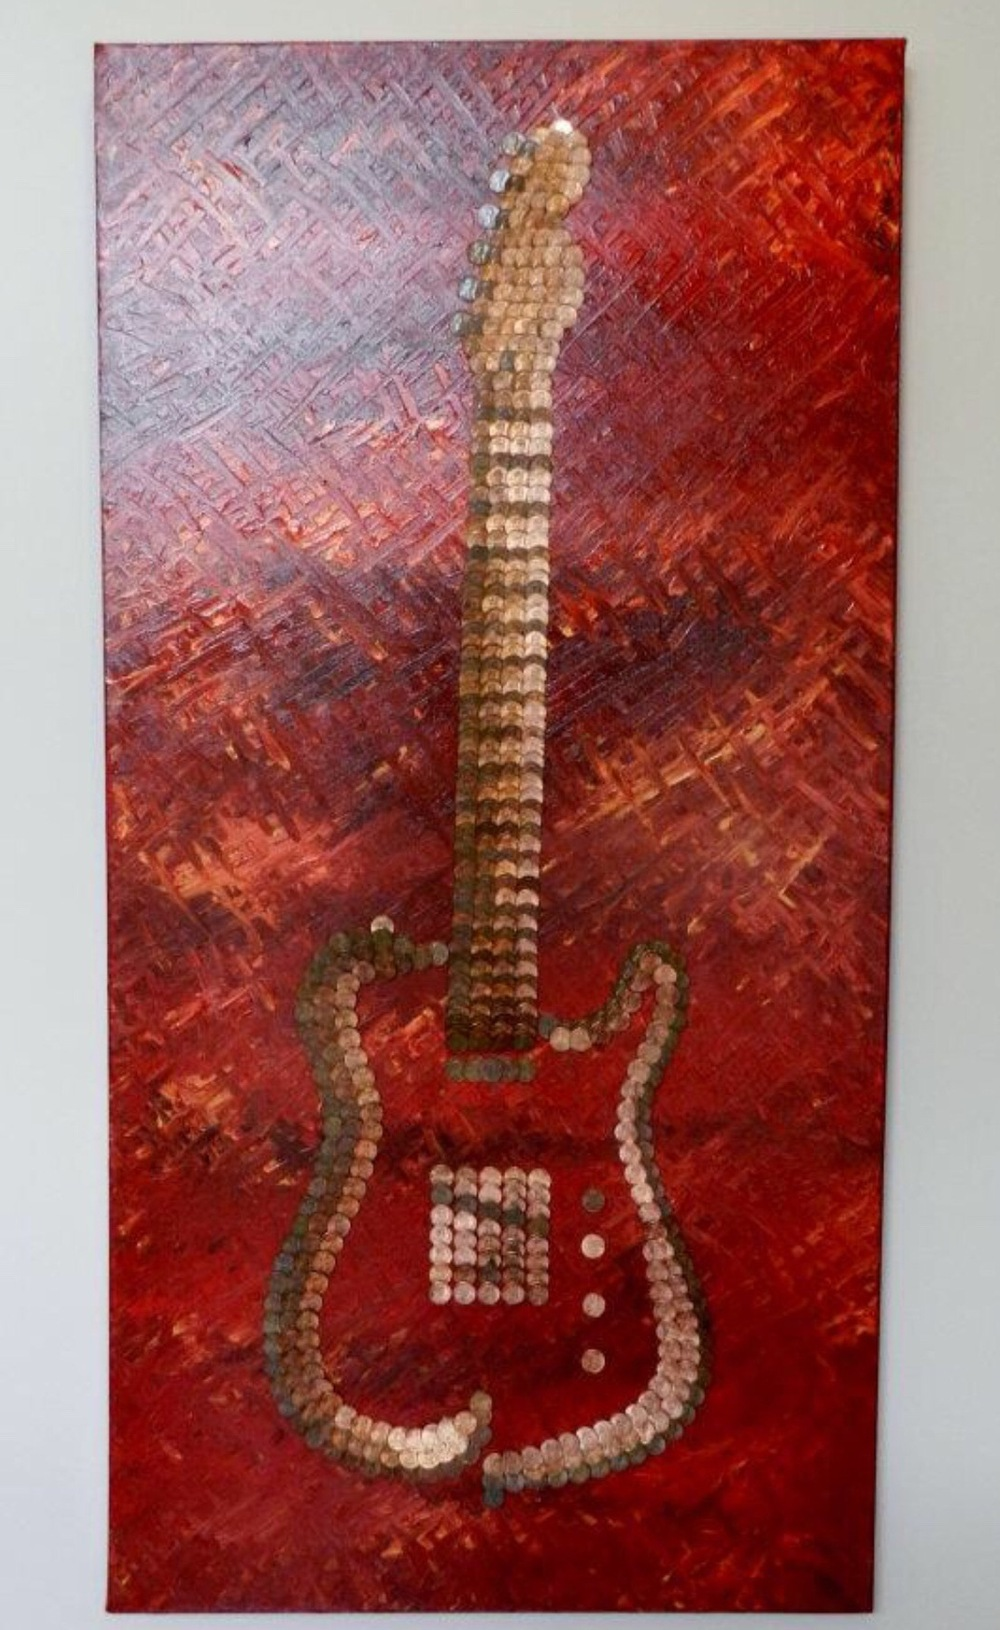 Bespoke Art by Liisa Garceau - Custom abstract guitar. Mixed media; acrylic & American pennies.